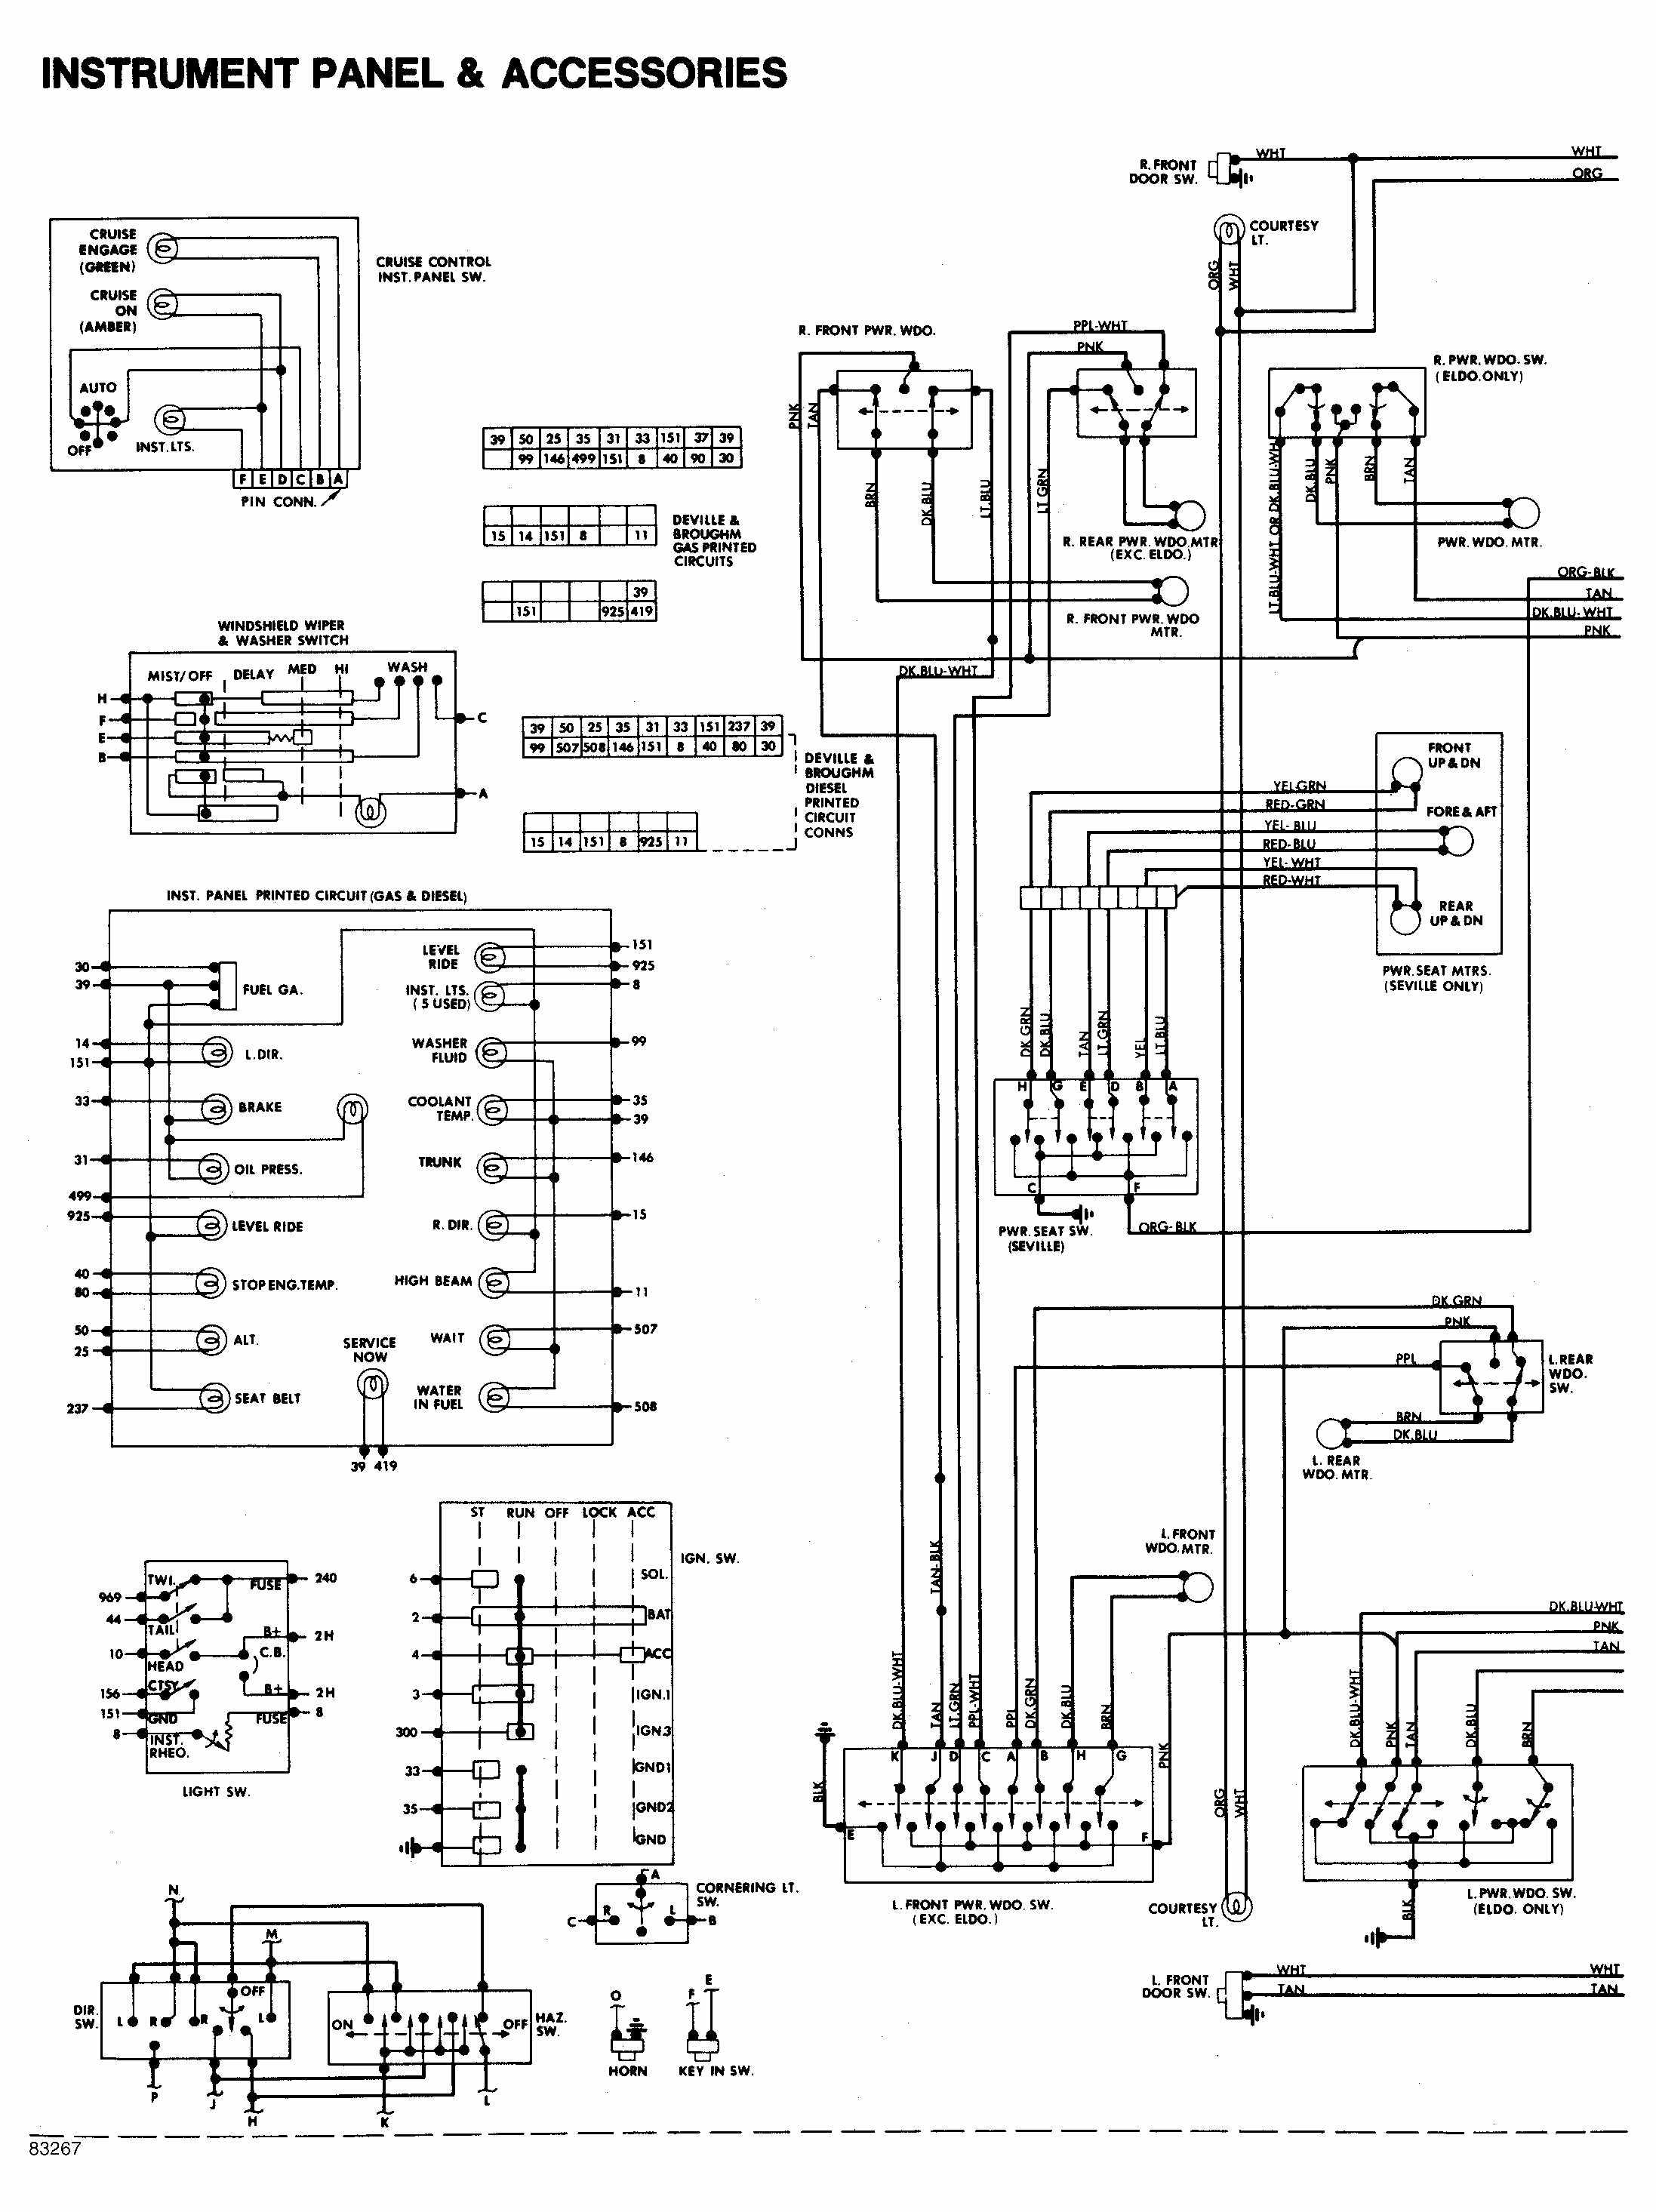 1994 Cadillac Wiring Schematic | Wiring Diagram on 94 engine diagram, 94 transmission diagram, 94 fuse diagram,